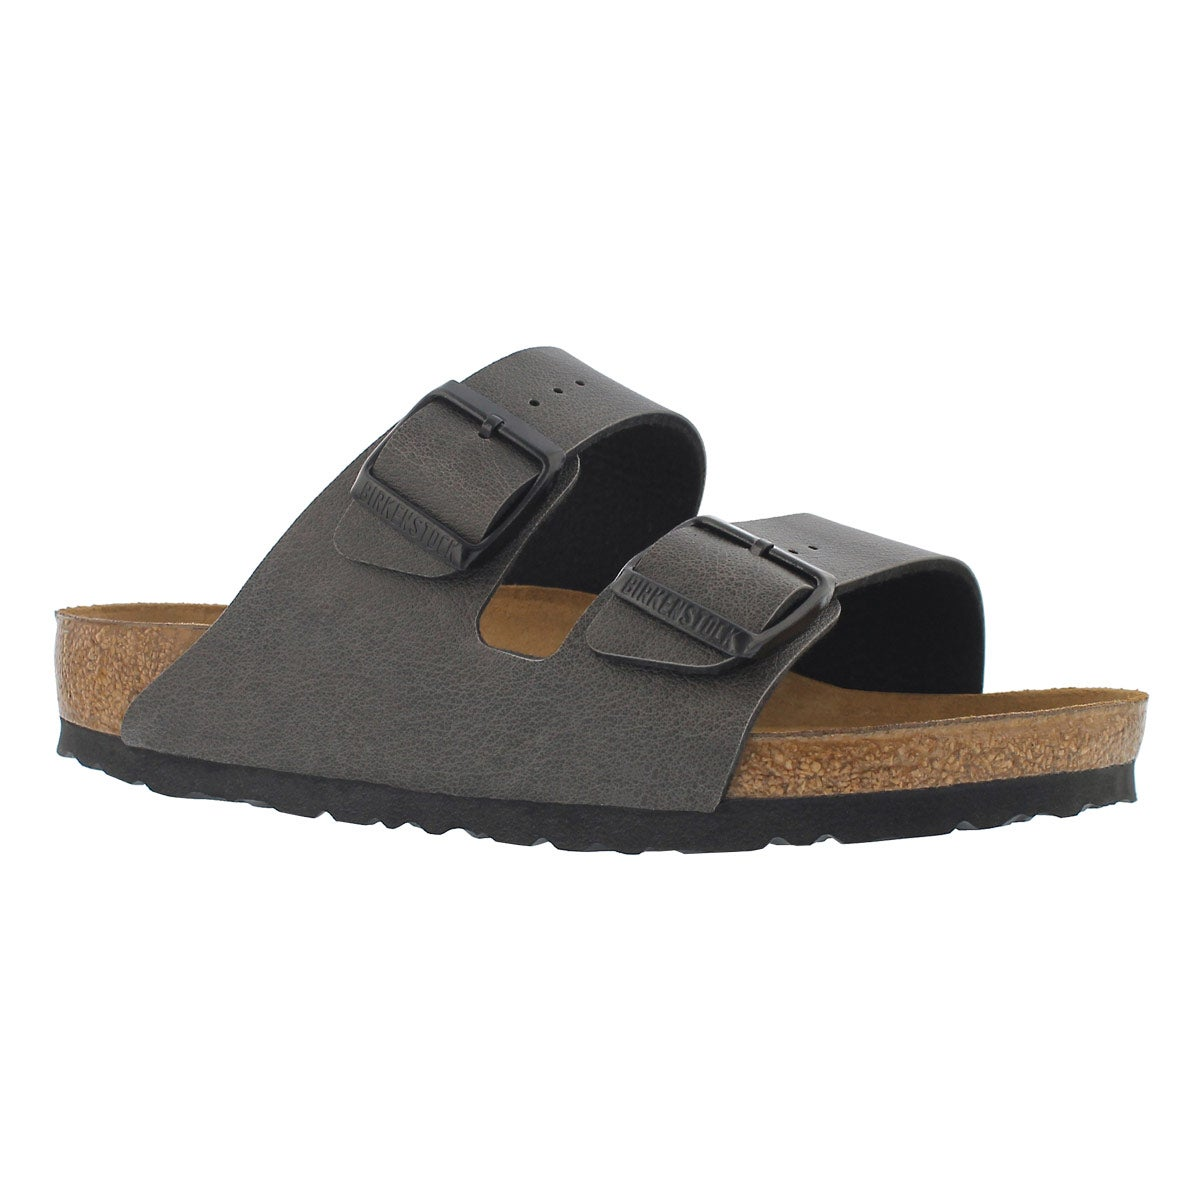 Womens sandals narrow - Birkenstock Arizona Eva Narrow Womens Sandals White Shoes 39 Eu